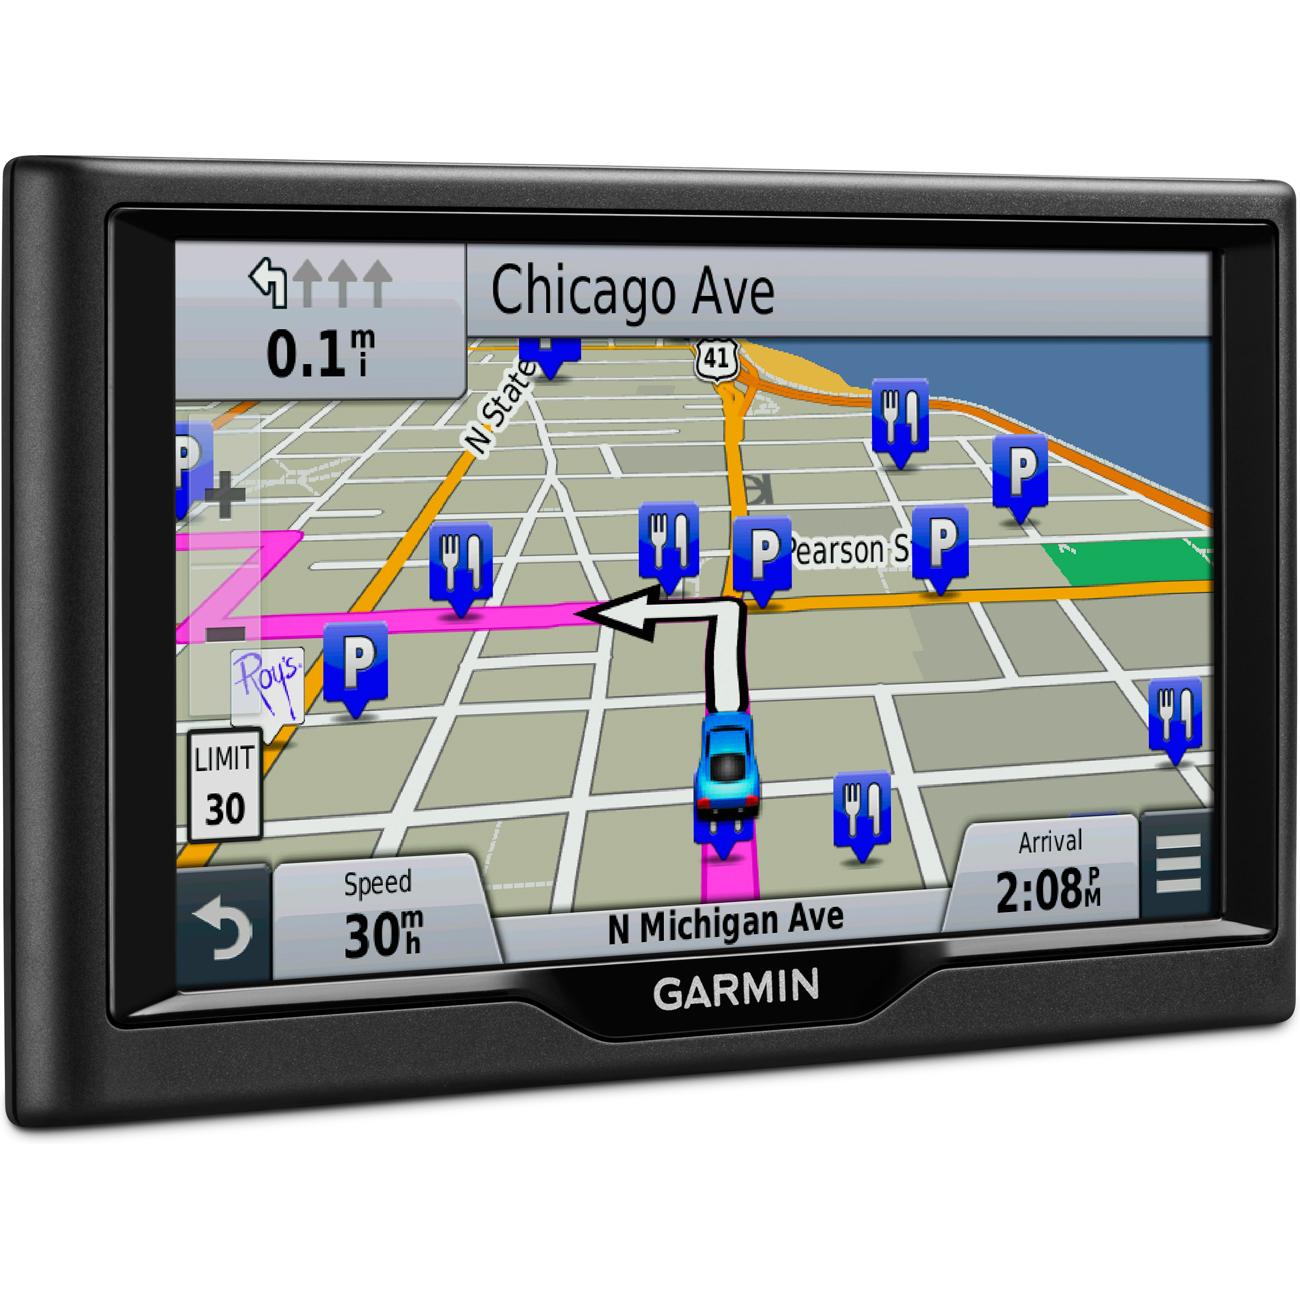 Garmin Nuvi LM  Essential Series  GPS Navigation System W - Chicago map gps